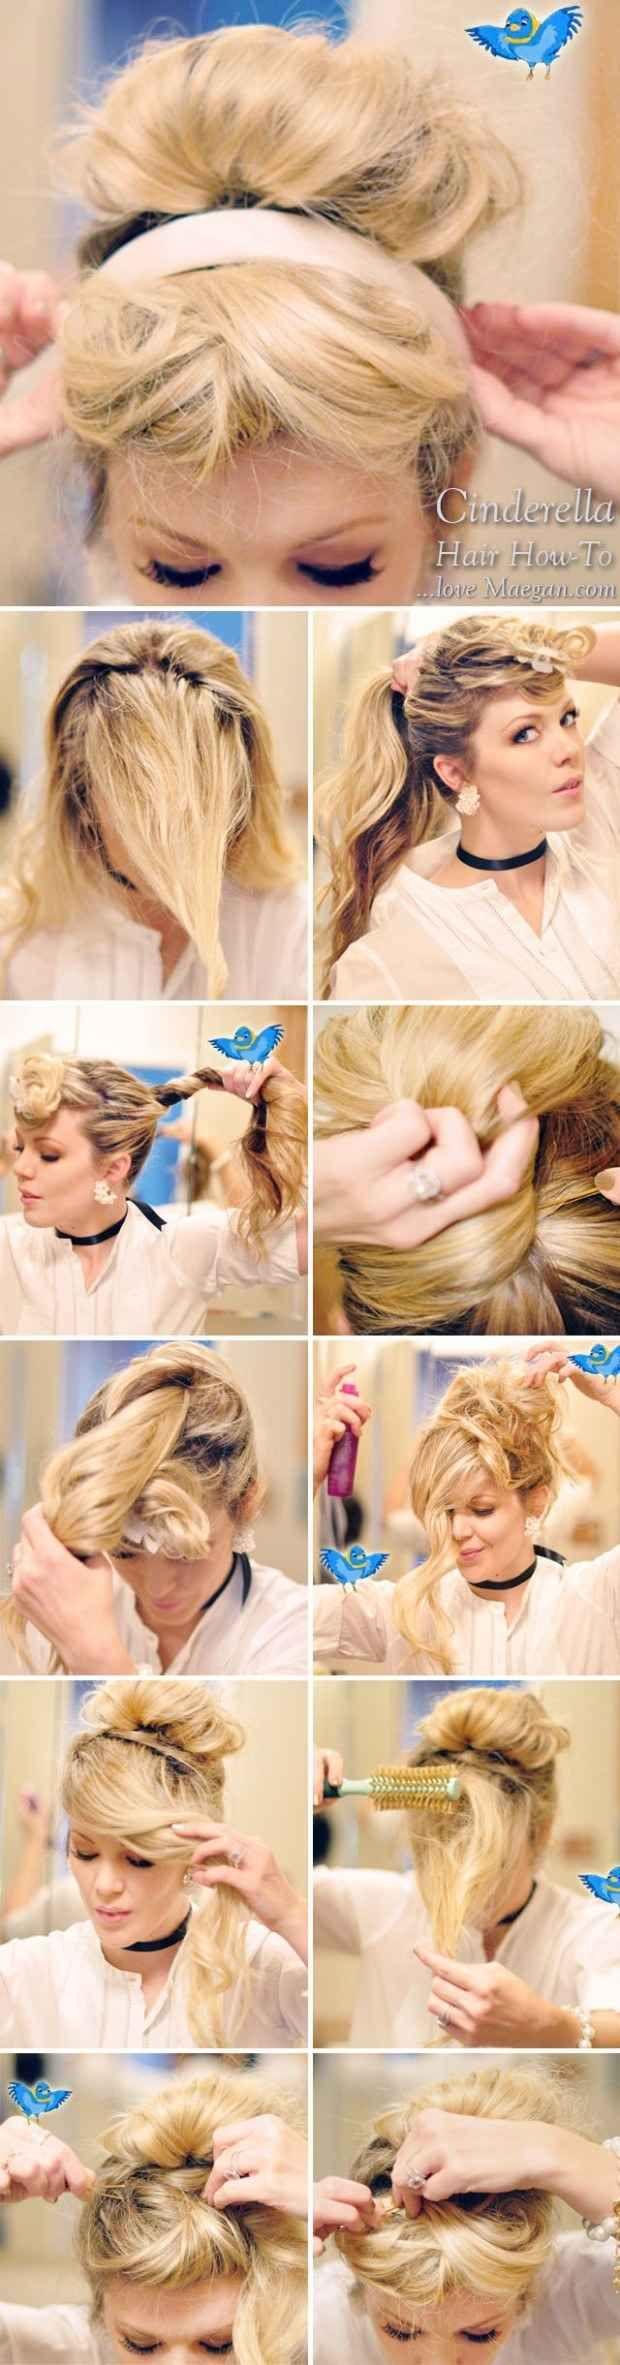 Cinderella's chic updo | 7 Easy Hair Tutorials Even Disney Princesses Would Envy